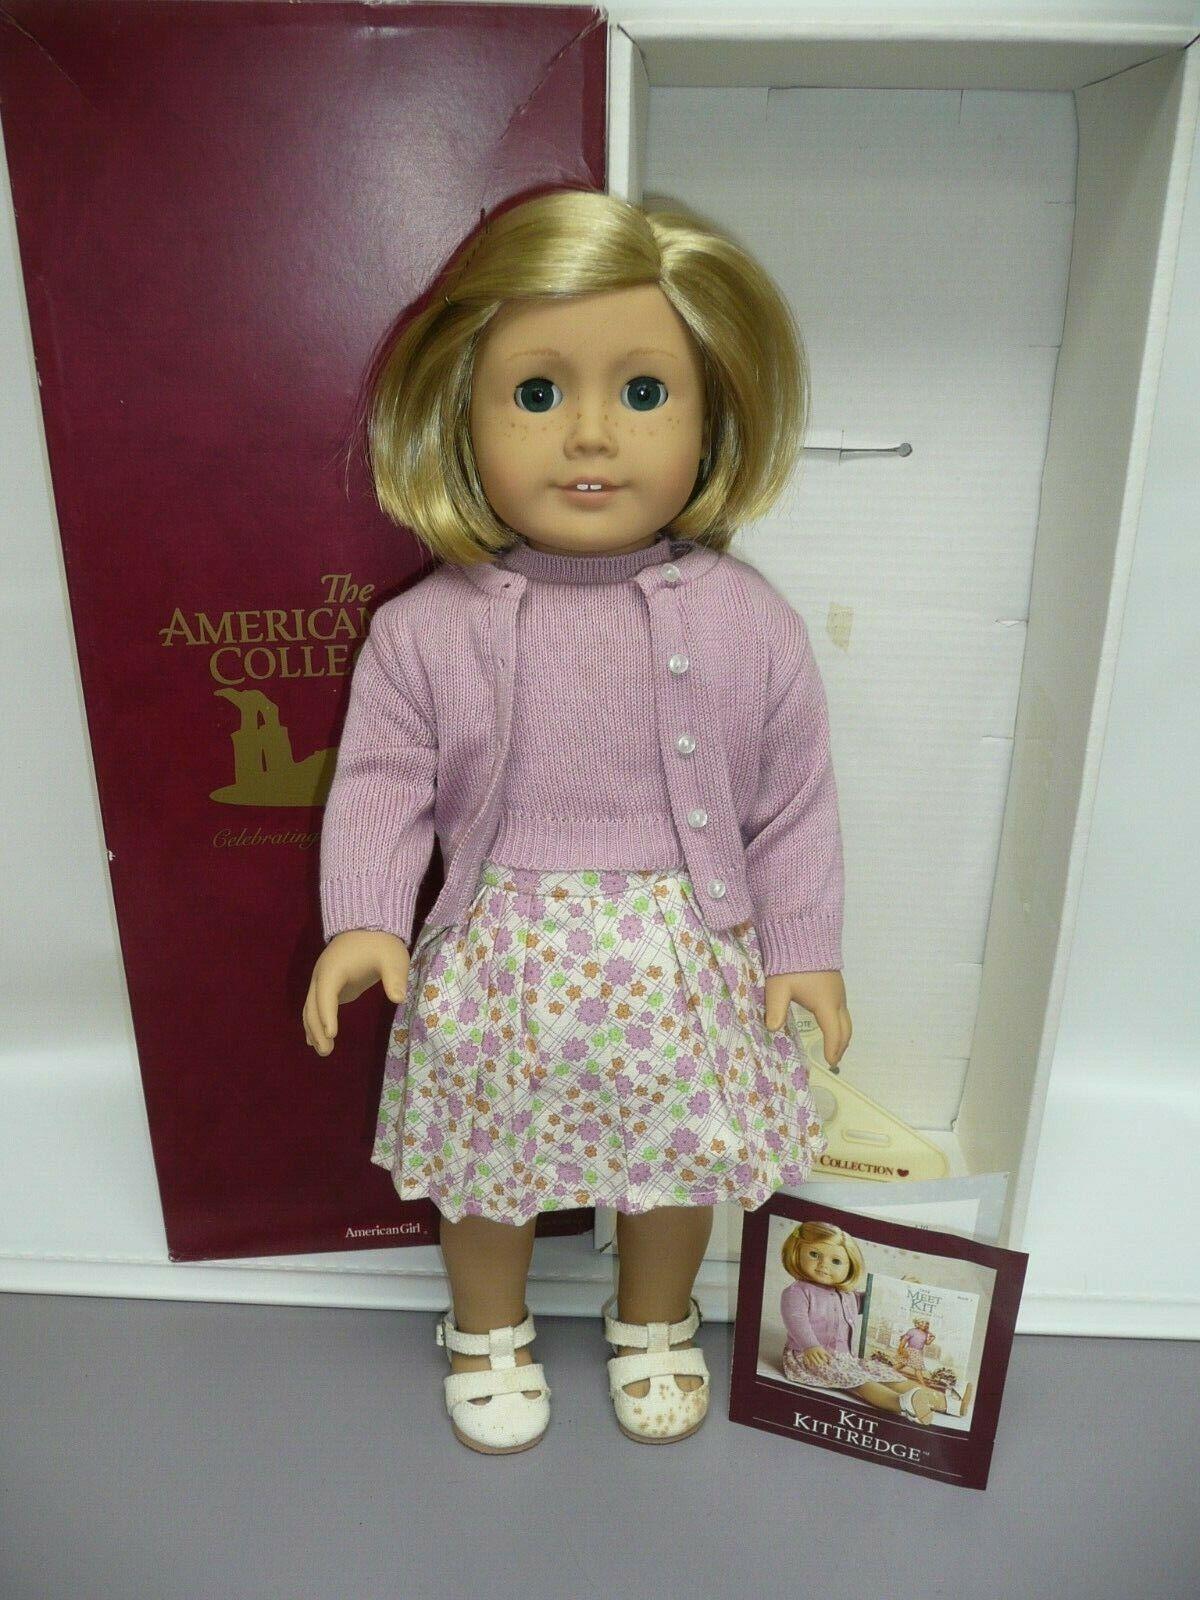 American Girl Pleasant Company Kit Kittrotge in Box, Original Clothes & Brochure